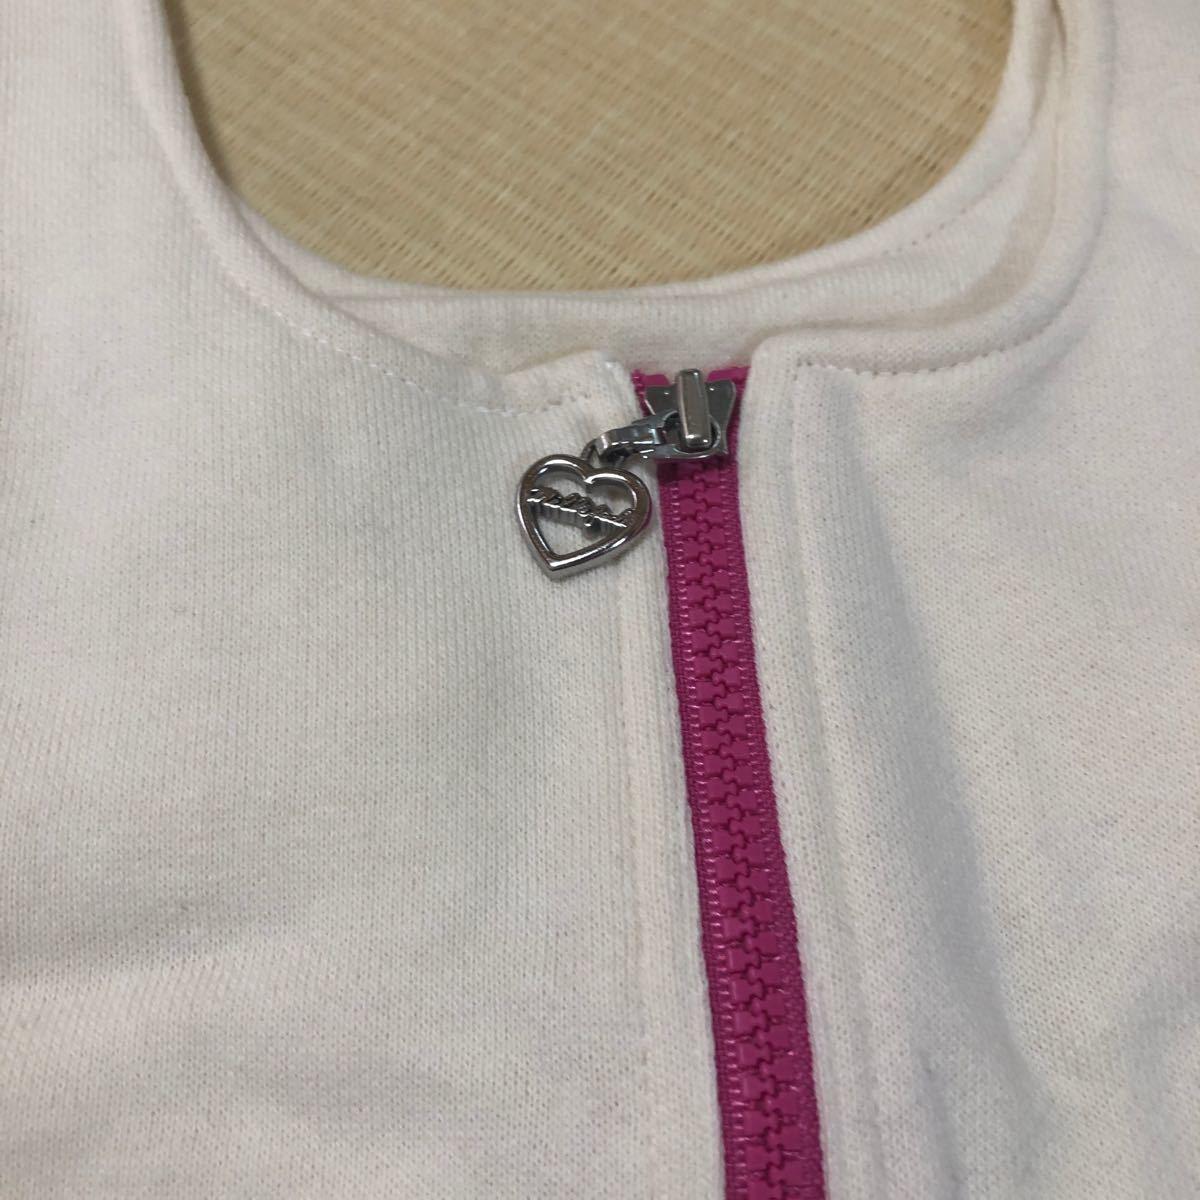 milk fedスカート 110サイズ 中古美品 送料込み